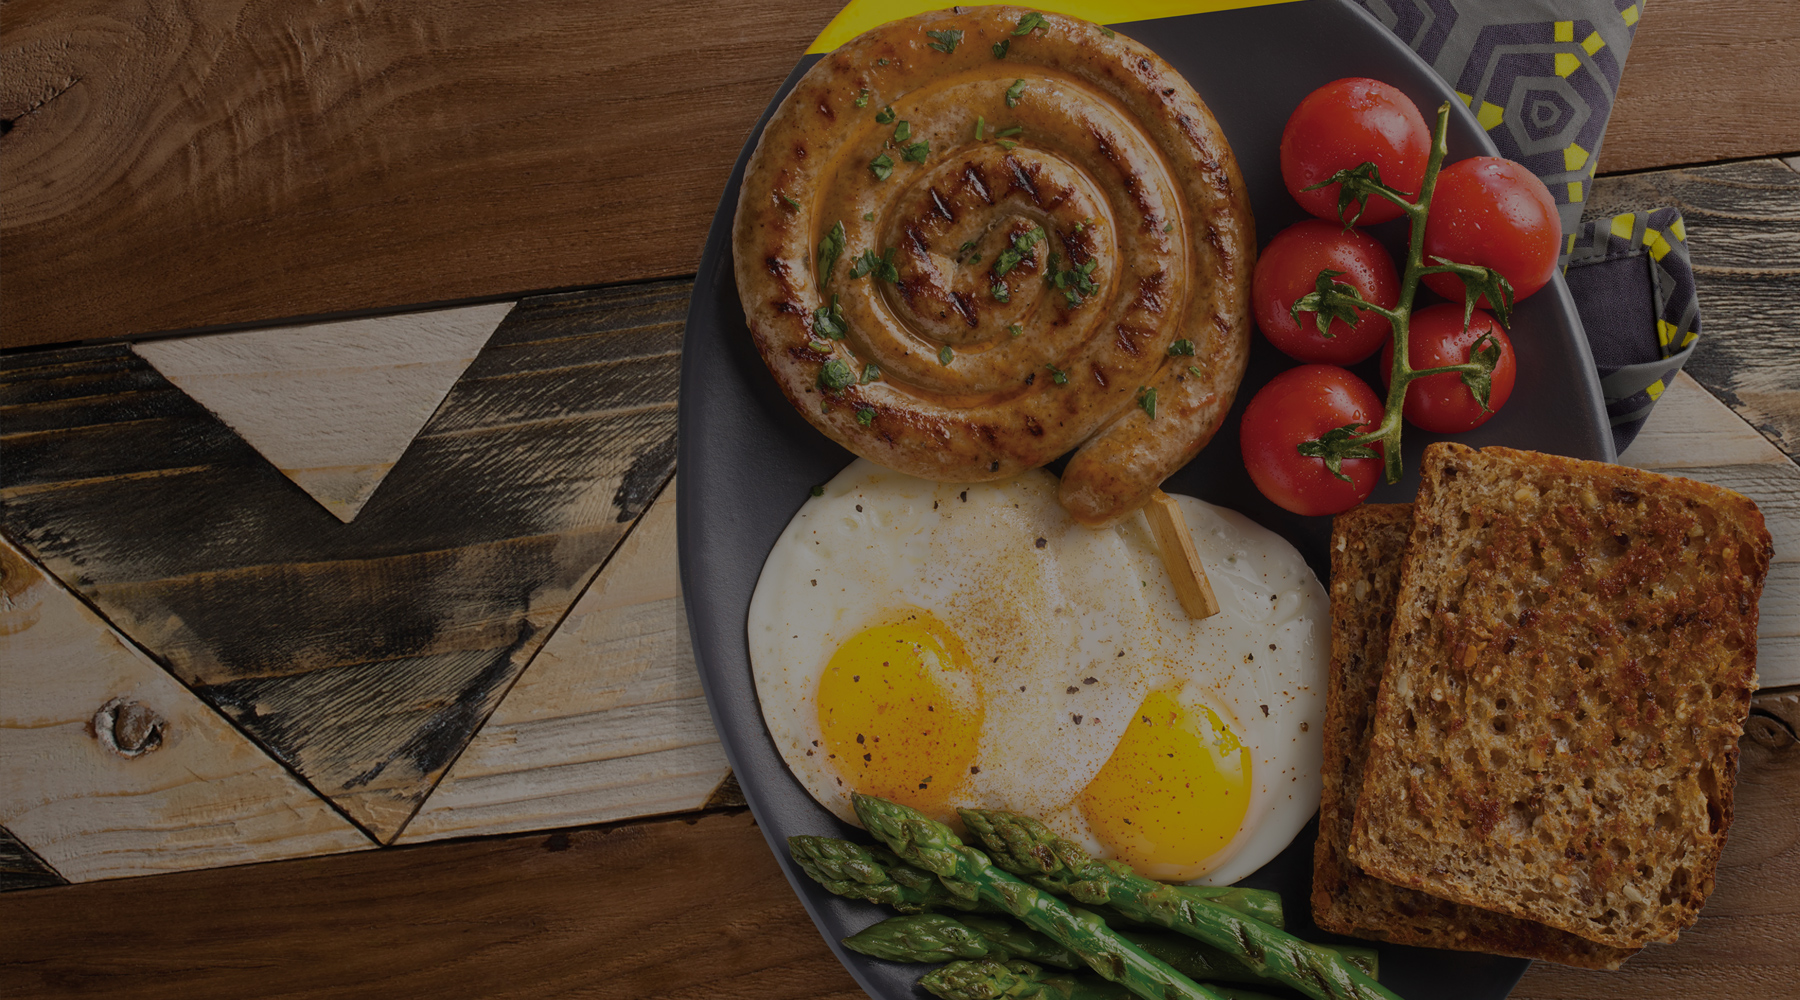 Breakfast at Nando's